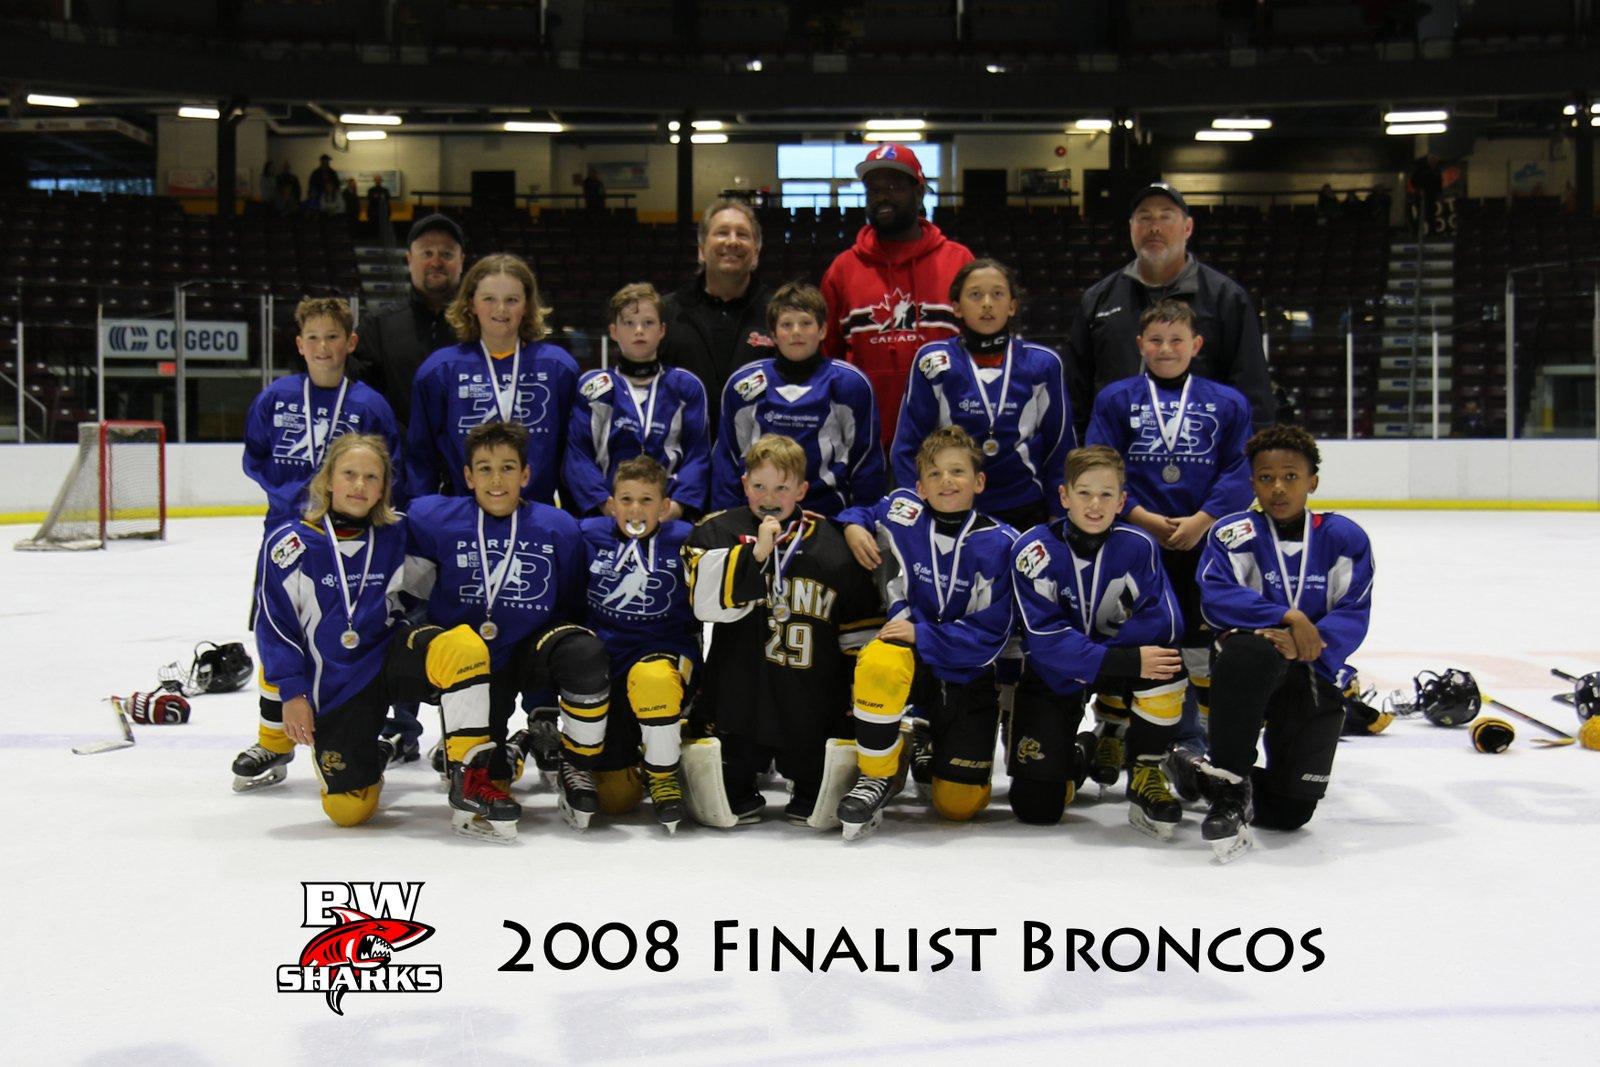 2008-Finalist-Broncos-SilverPeak-Studios-Canada-Sarnia-Bluewater-Sharks-Tournament-001